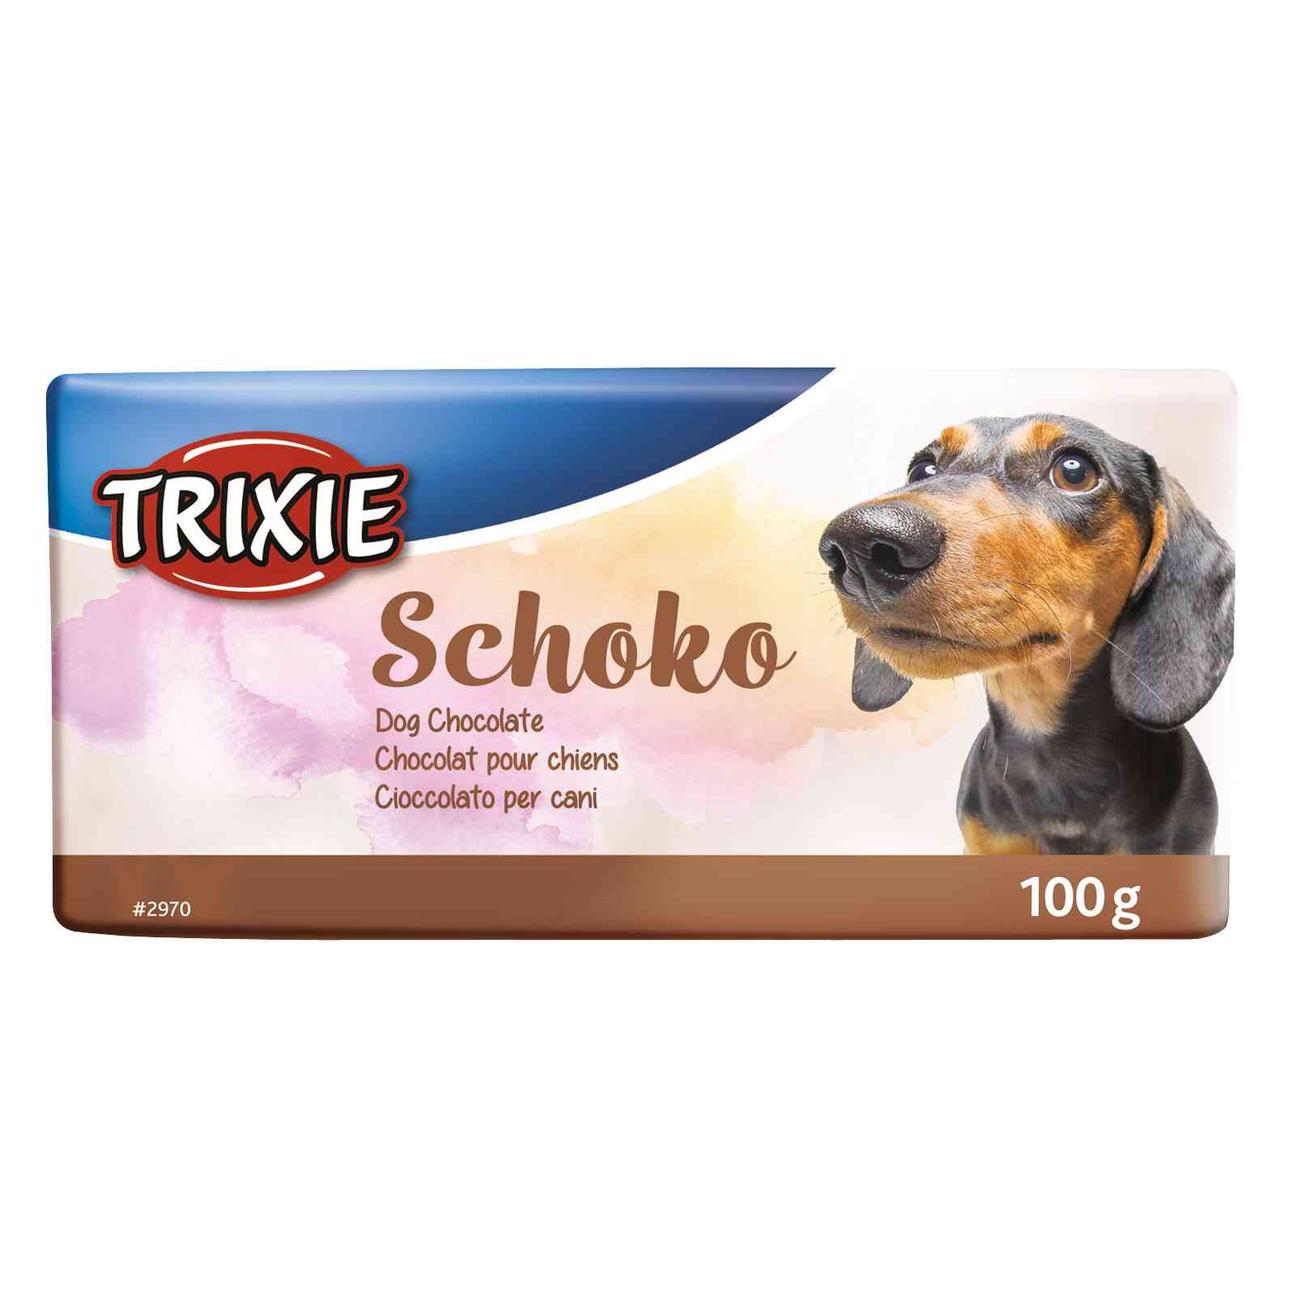 "Trixie Hunde Schokolade ""Schoko"", 100 g"